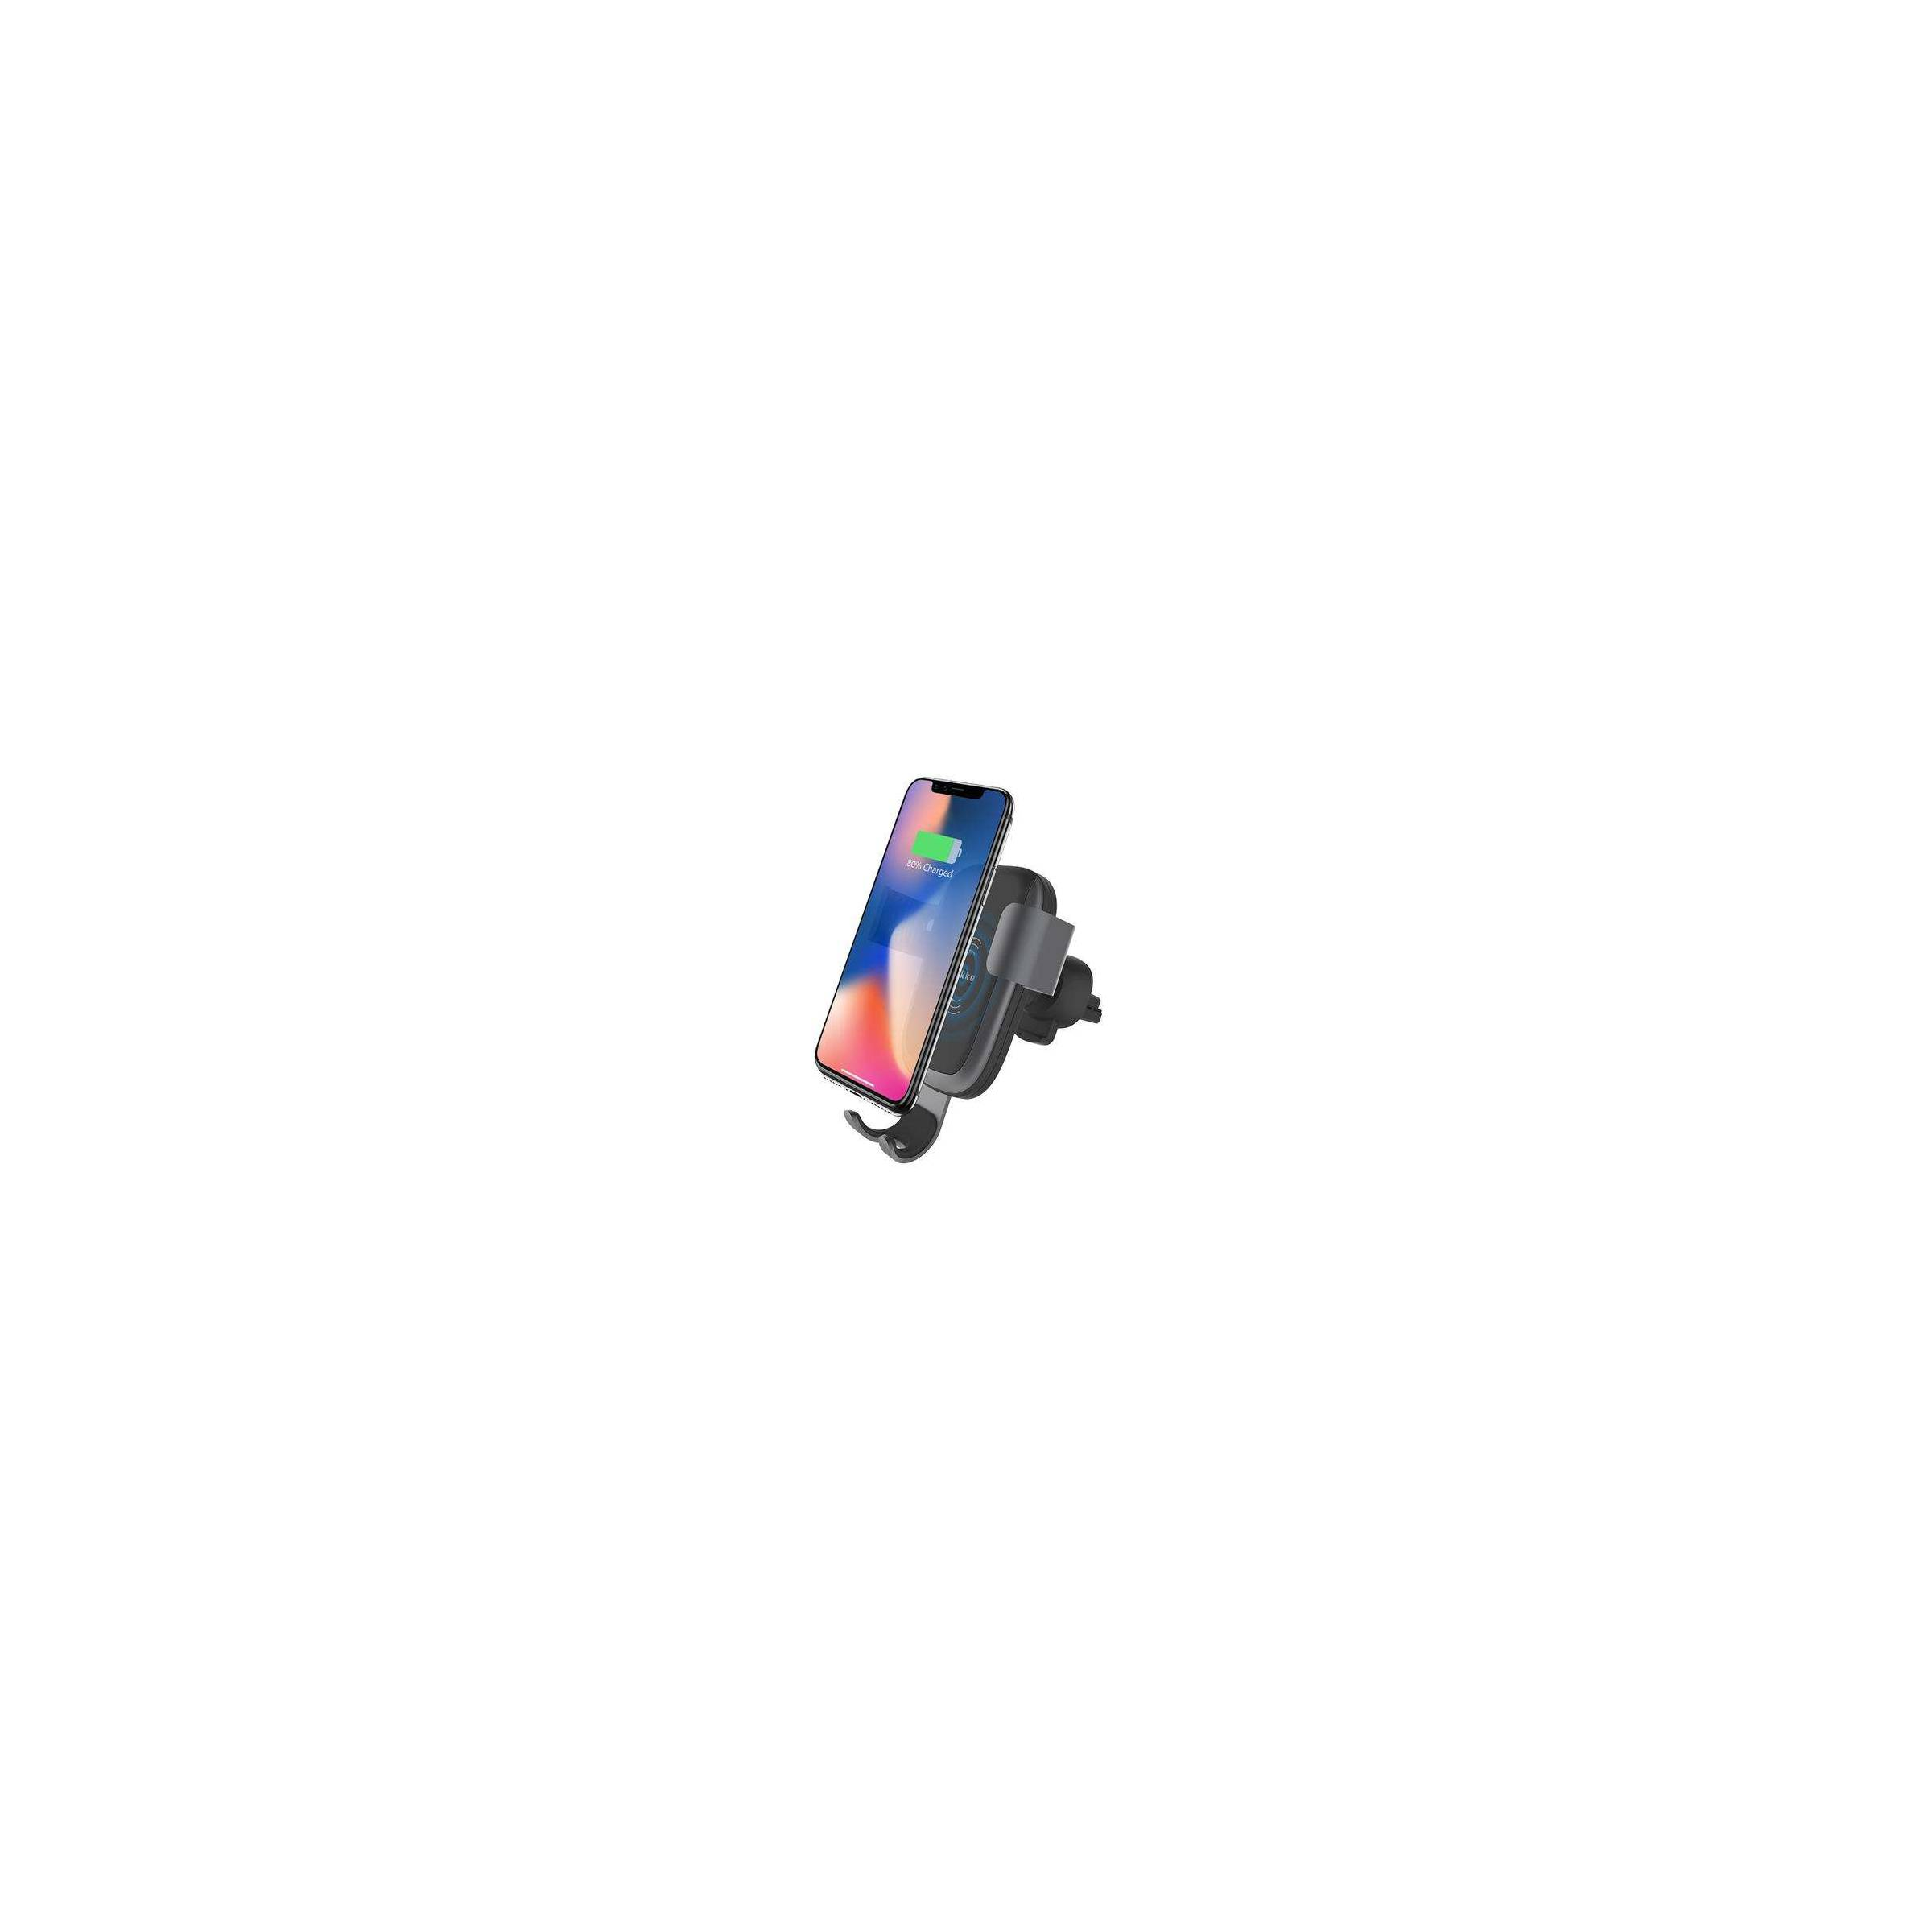 zikko Zikko gravity trådløs mobilholder til bil på mackabler.dk